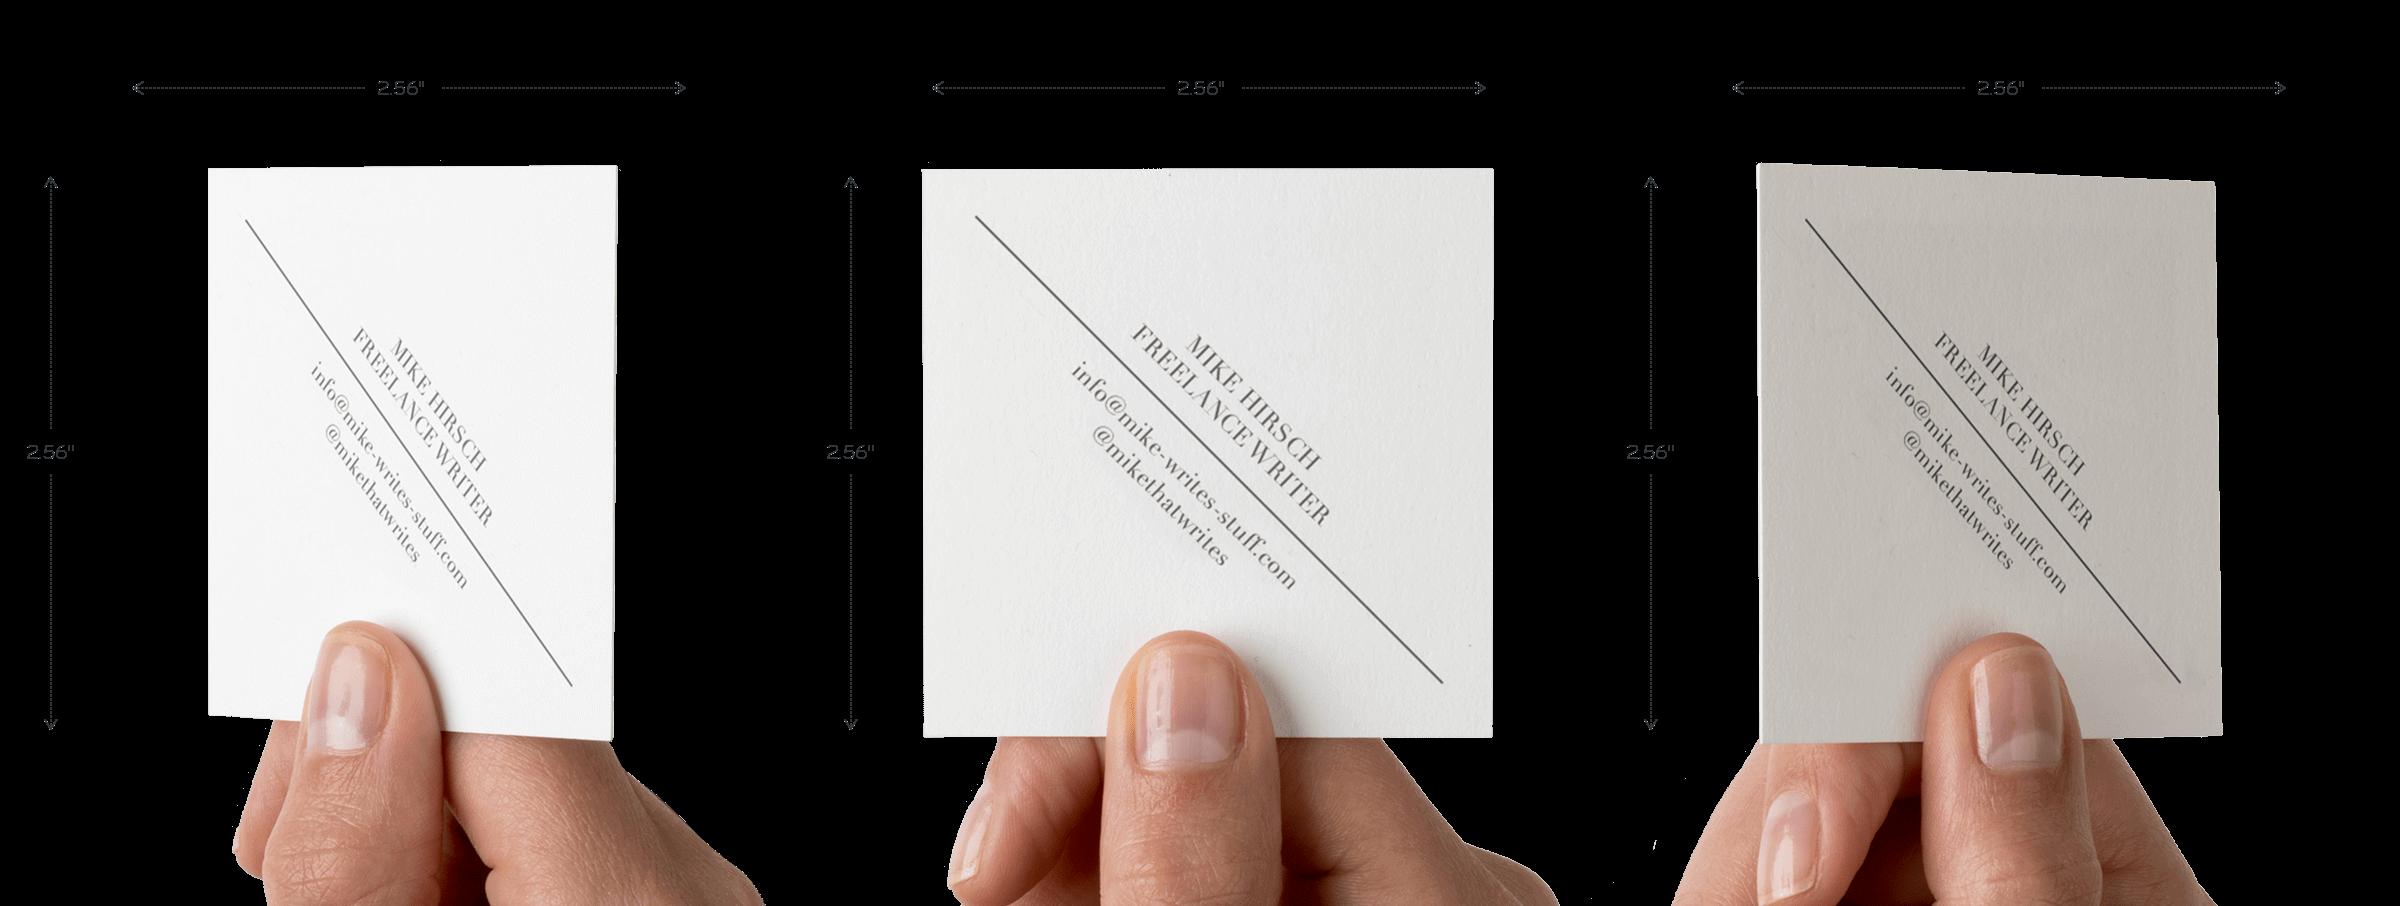 Square 2.56″ x 2.56″ Cotton Business Cards